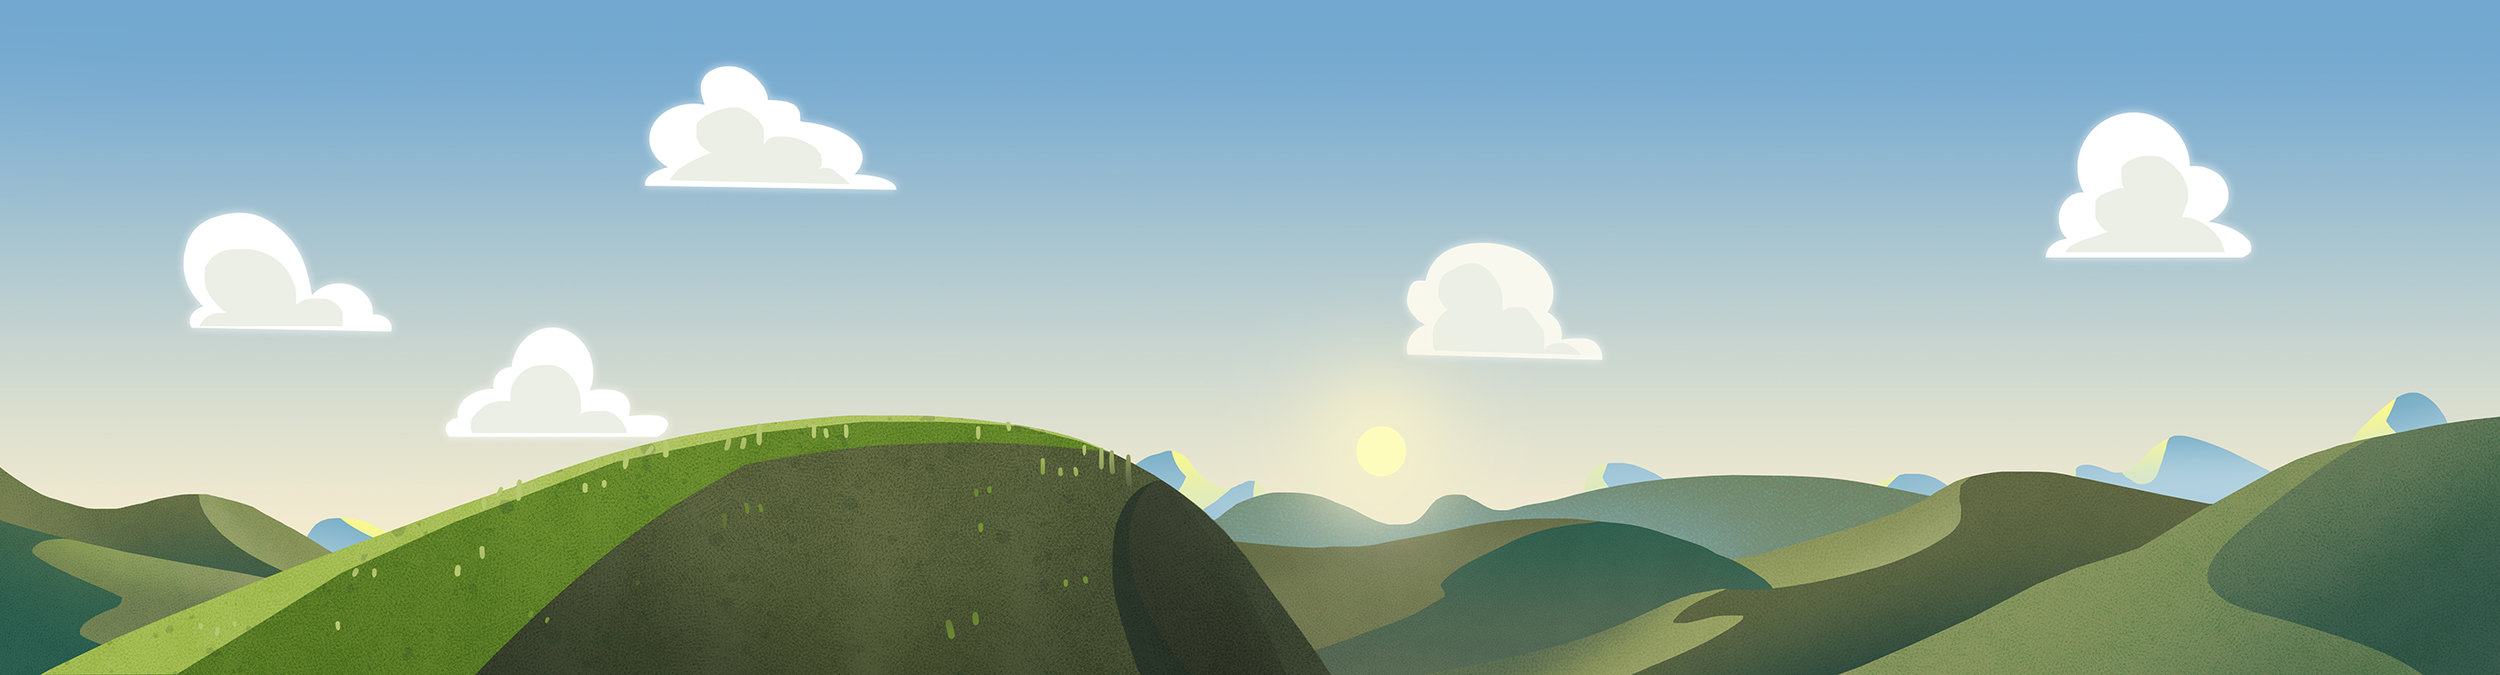 Coastal_Animation_Grass_Hills_02.jpg